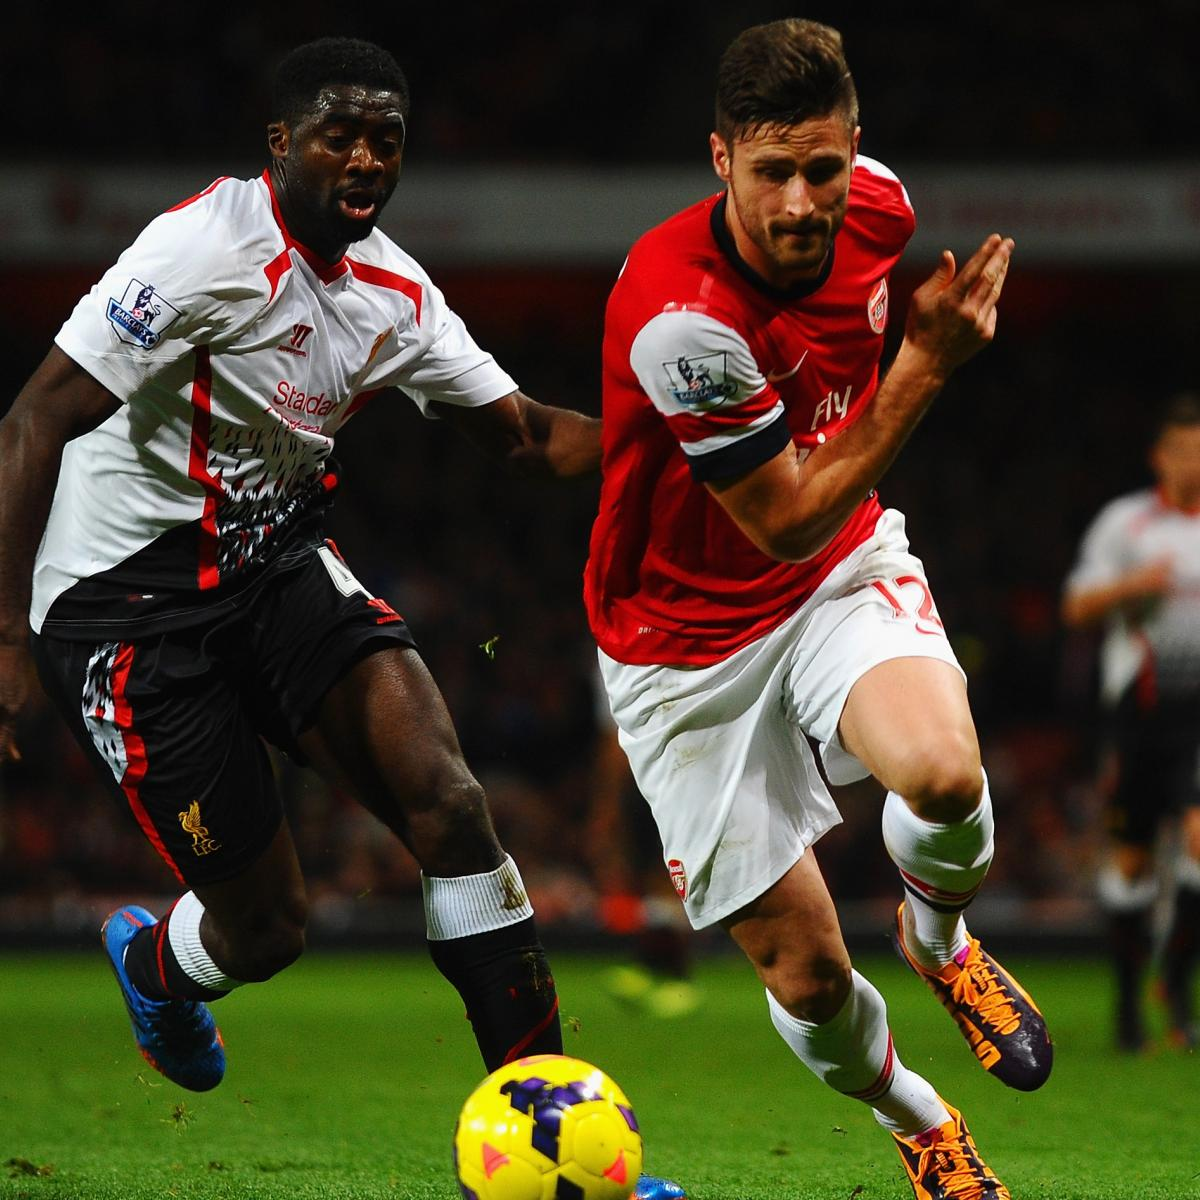 Arsenal Vs Tottenham Live Score Highlights From Premier: Arsenal Vs. Liverpool: Premier League Live Score